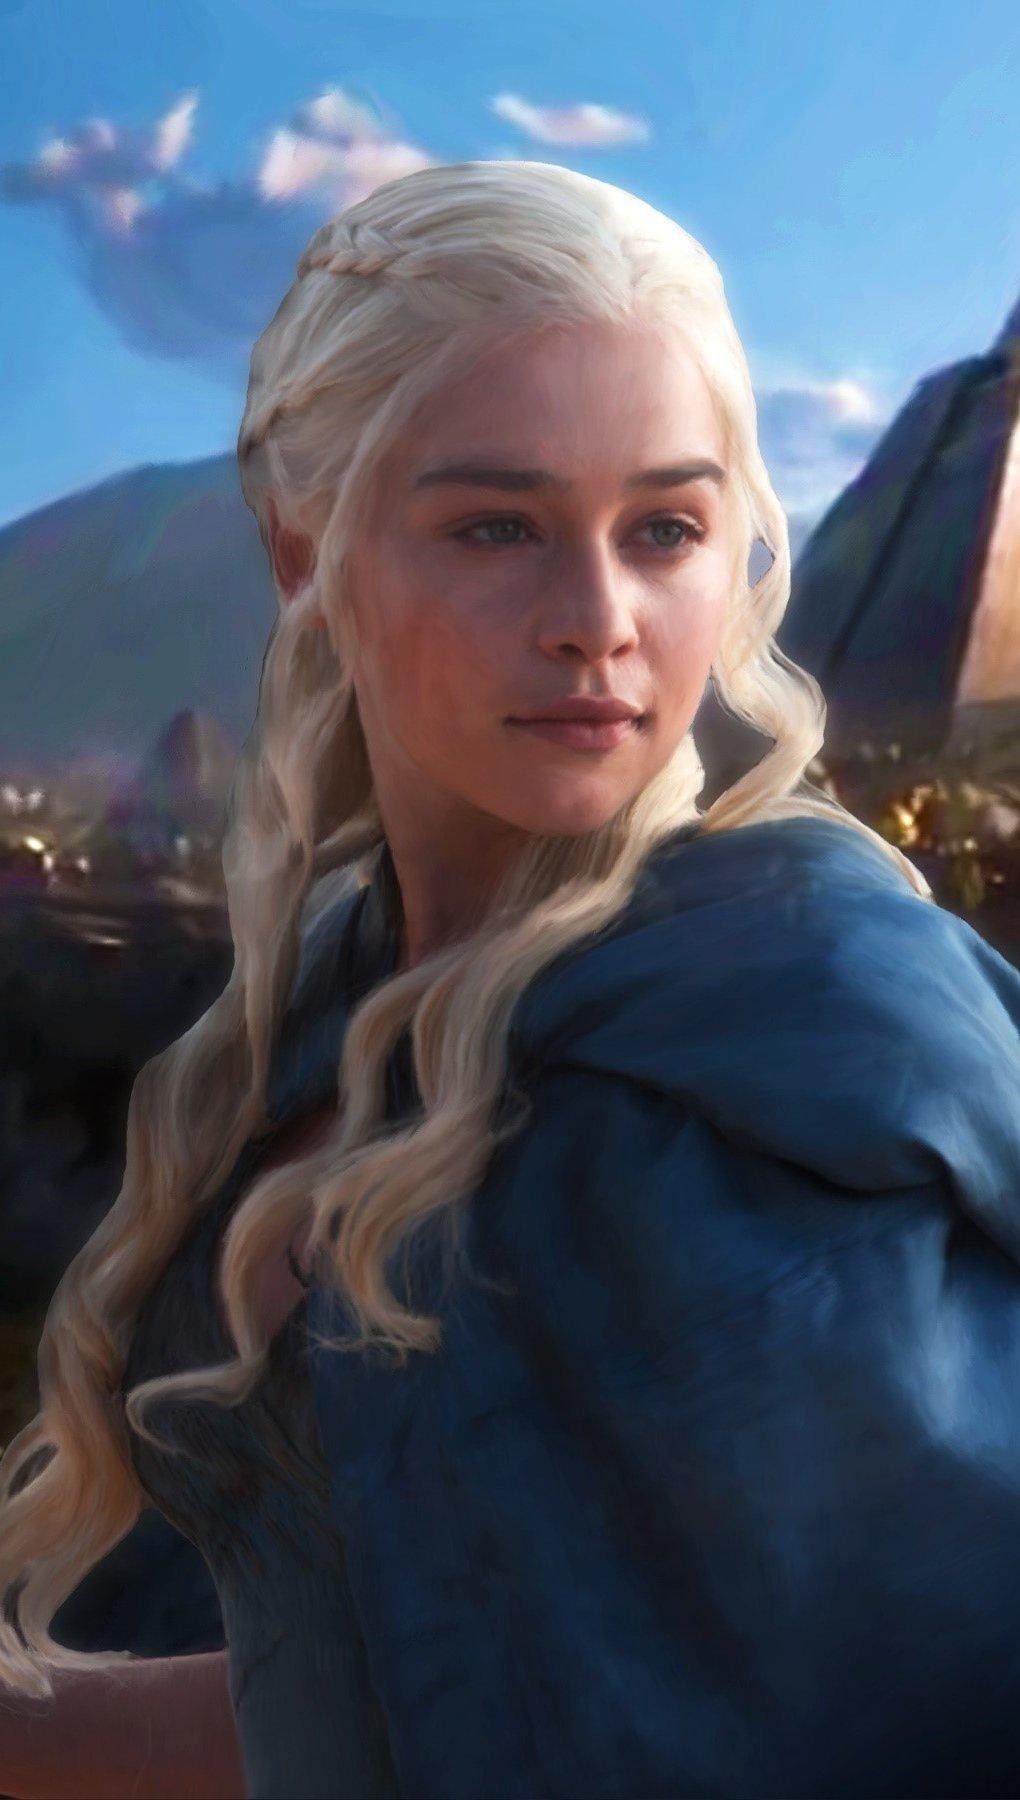 Wallpaper Daenerys Targaryen Vertical